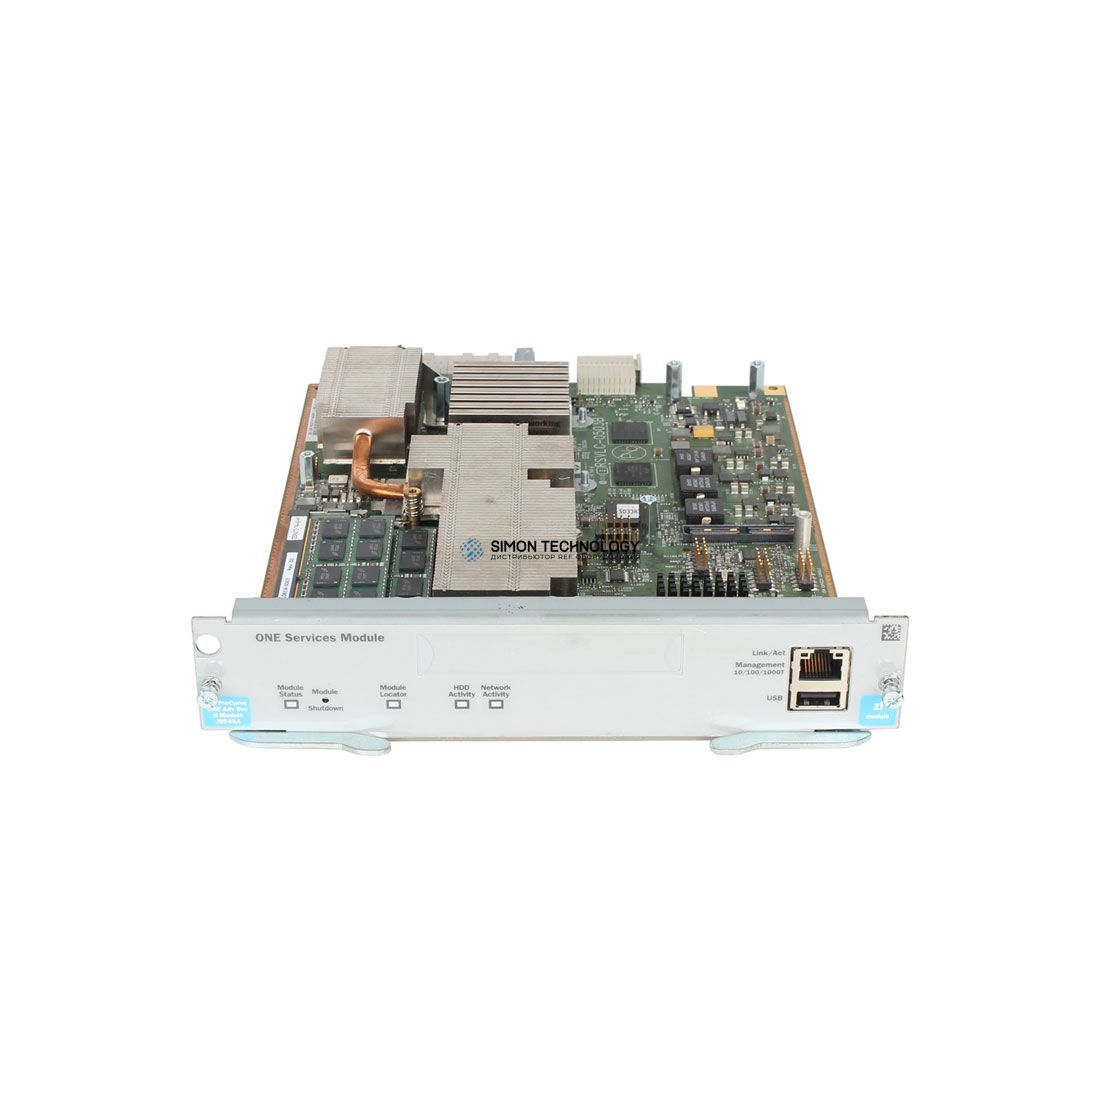 Модуль HP HPE ONE Advanced Services zl Module (J9545-61001)